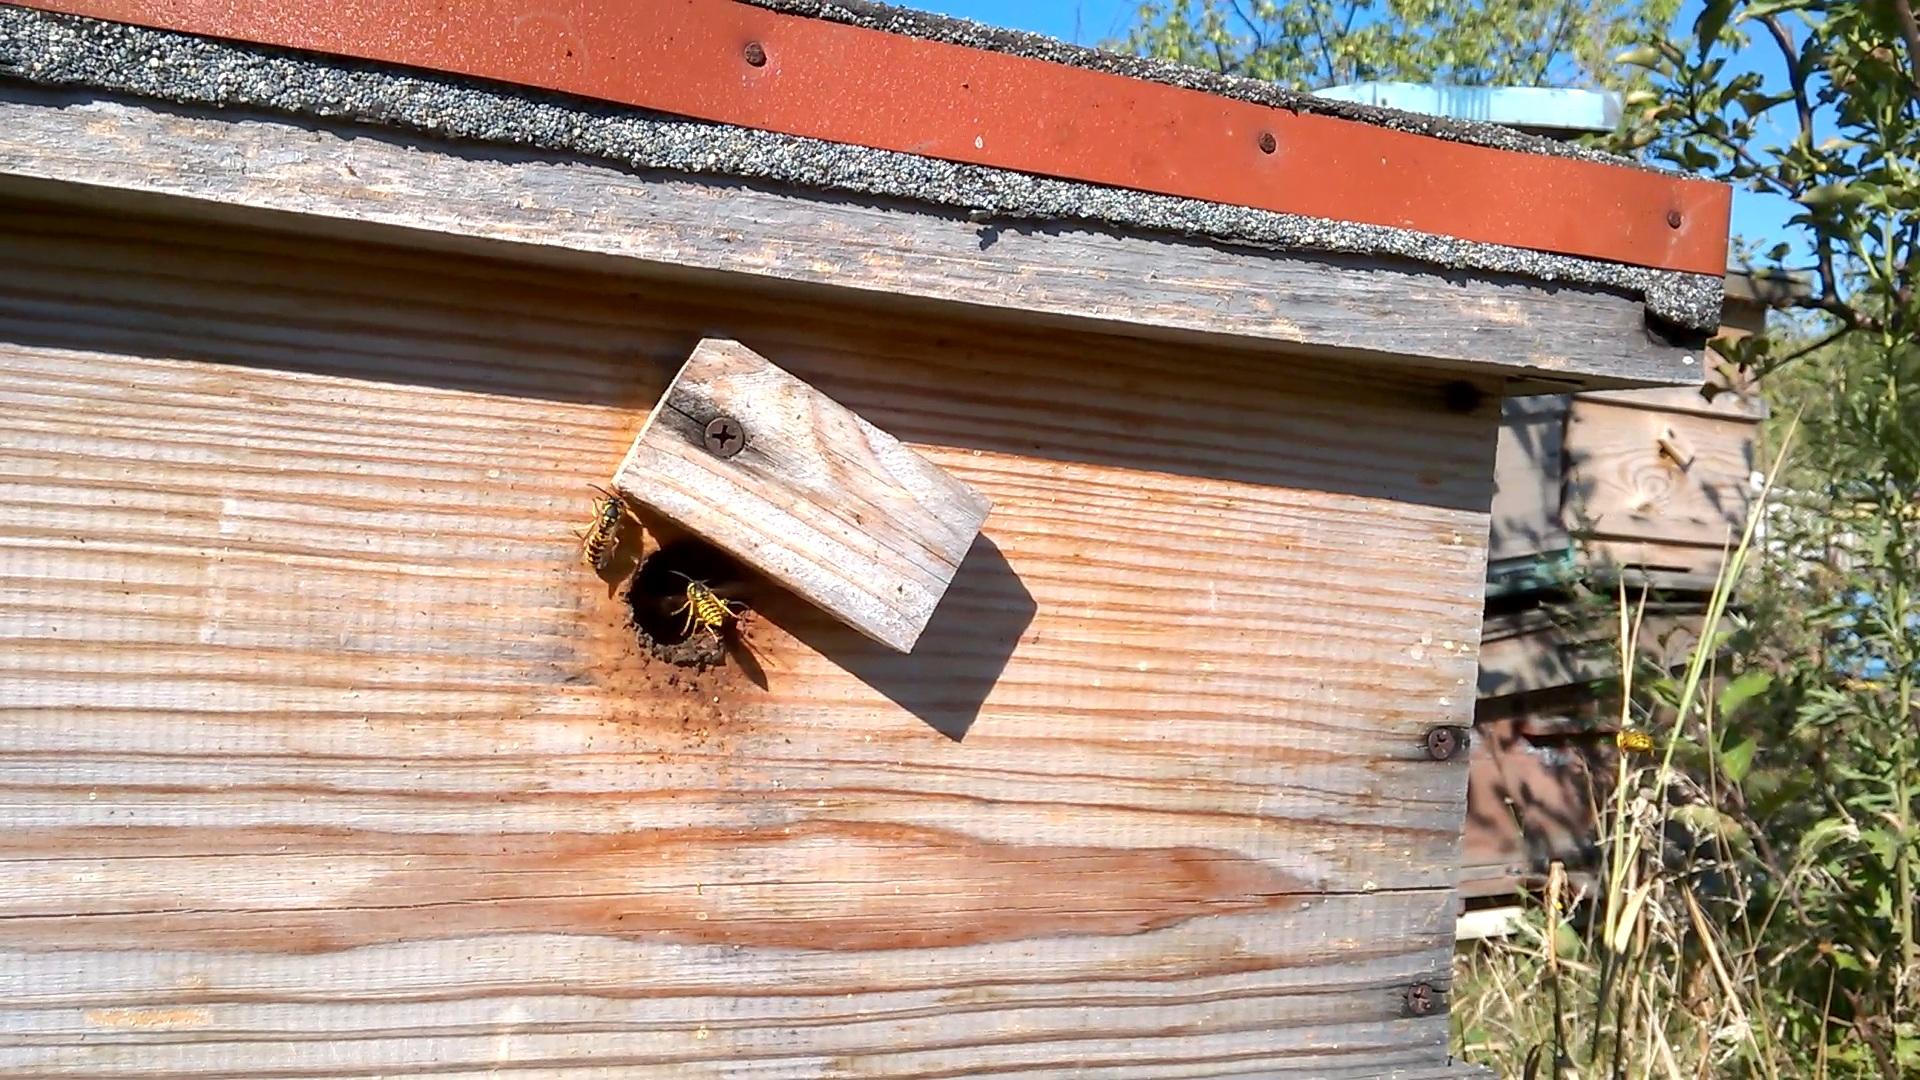 Осы и пчелиная пасека. Wasp and bee apiary